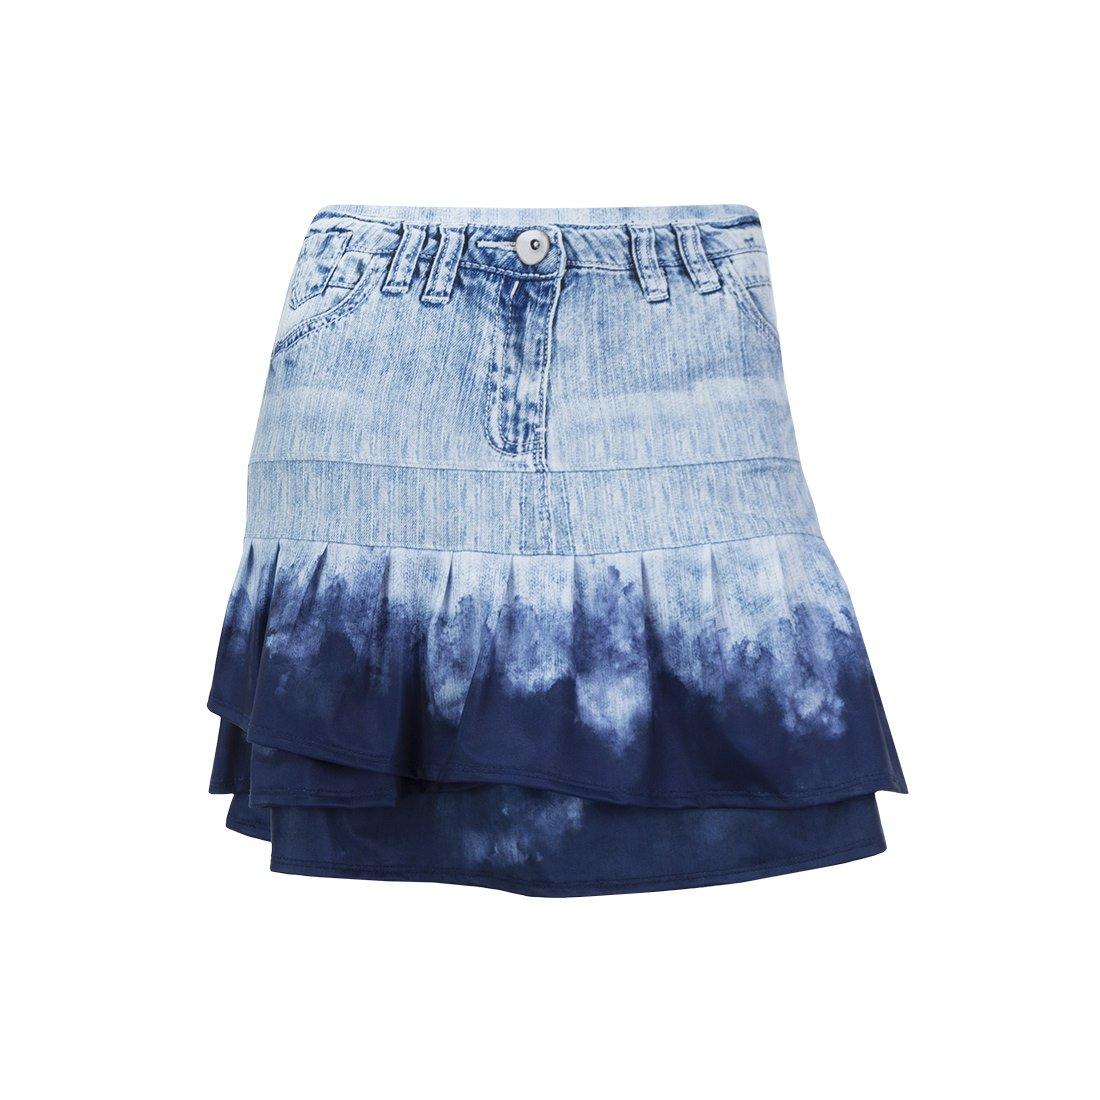 Lucky In Love American Love Story Long Dye Denim Skirt (Medium) by Lucky In Love (Image #1)